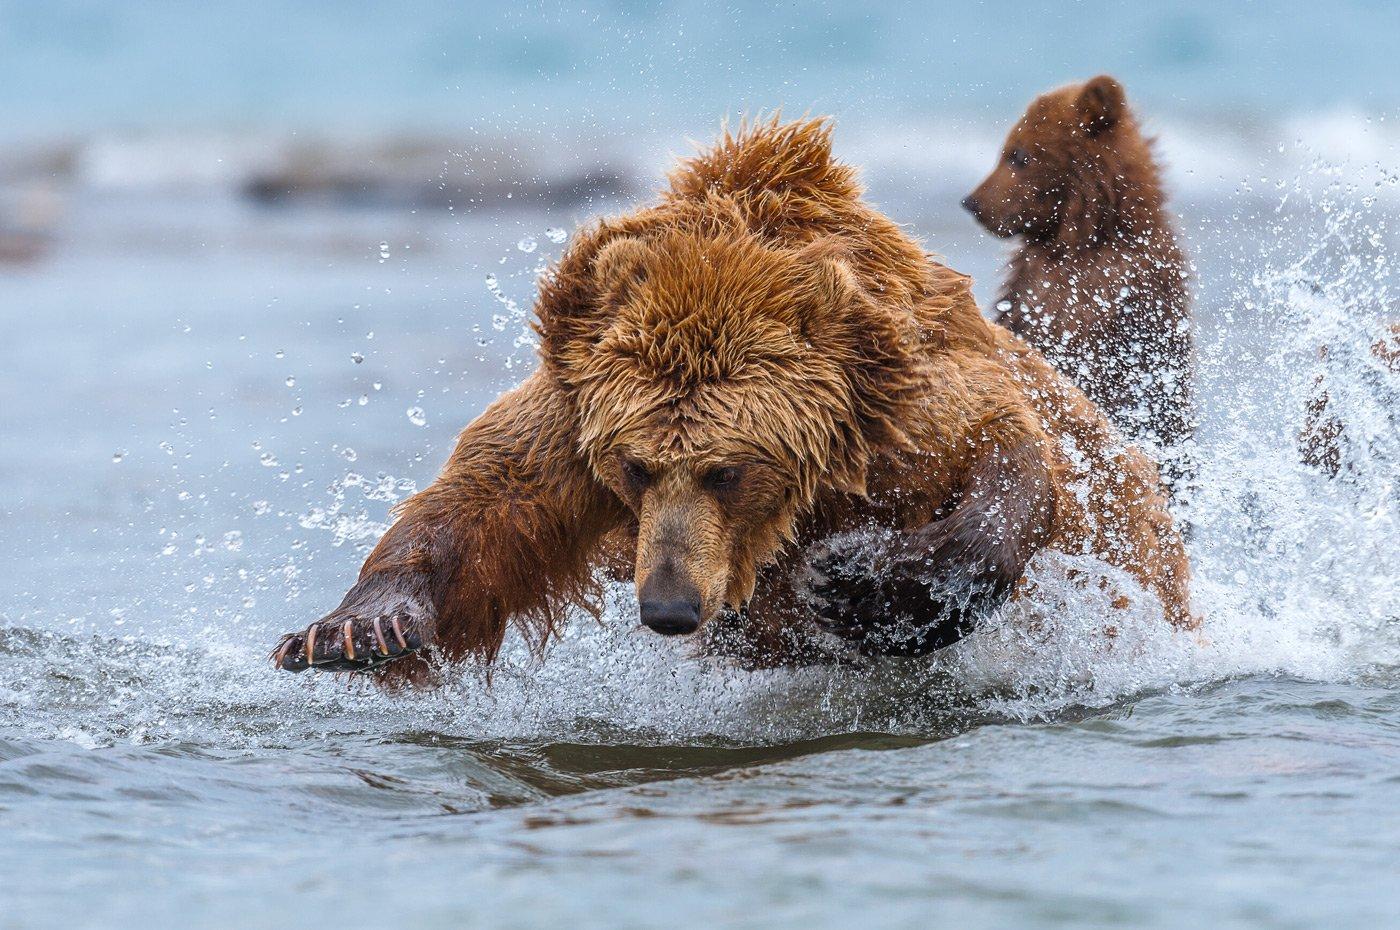 камчатка, бурый медведь,курильское озеро, сергей иванов, Сергей Иванов